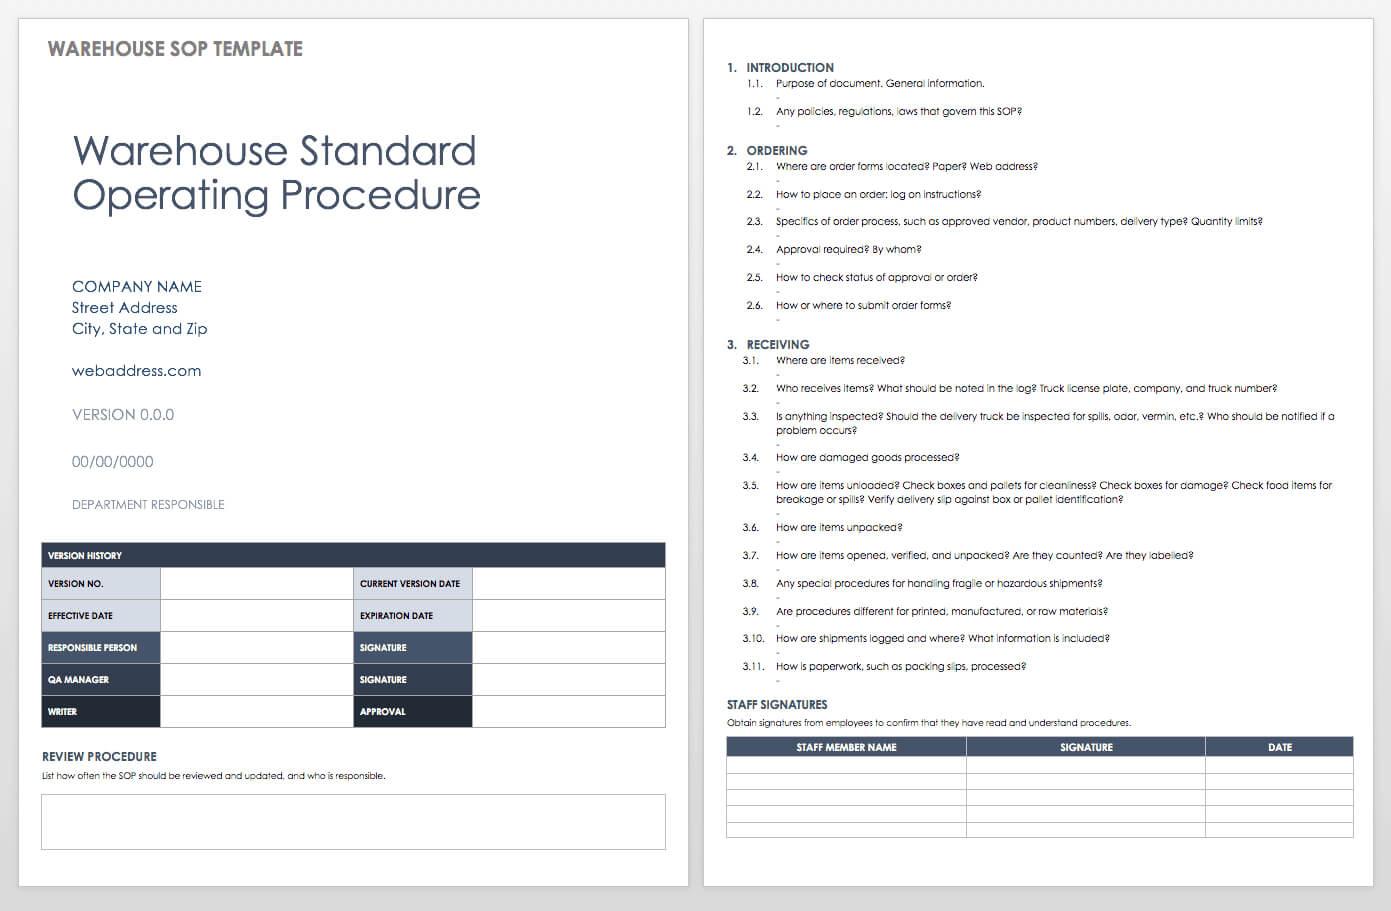 003 Standard Operating Procedure Template Word Ic Warehouse Within Free Standard Operating Procedure Template Word 2010